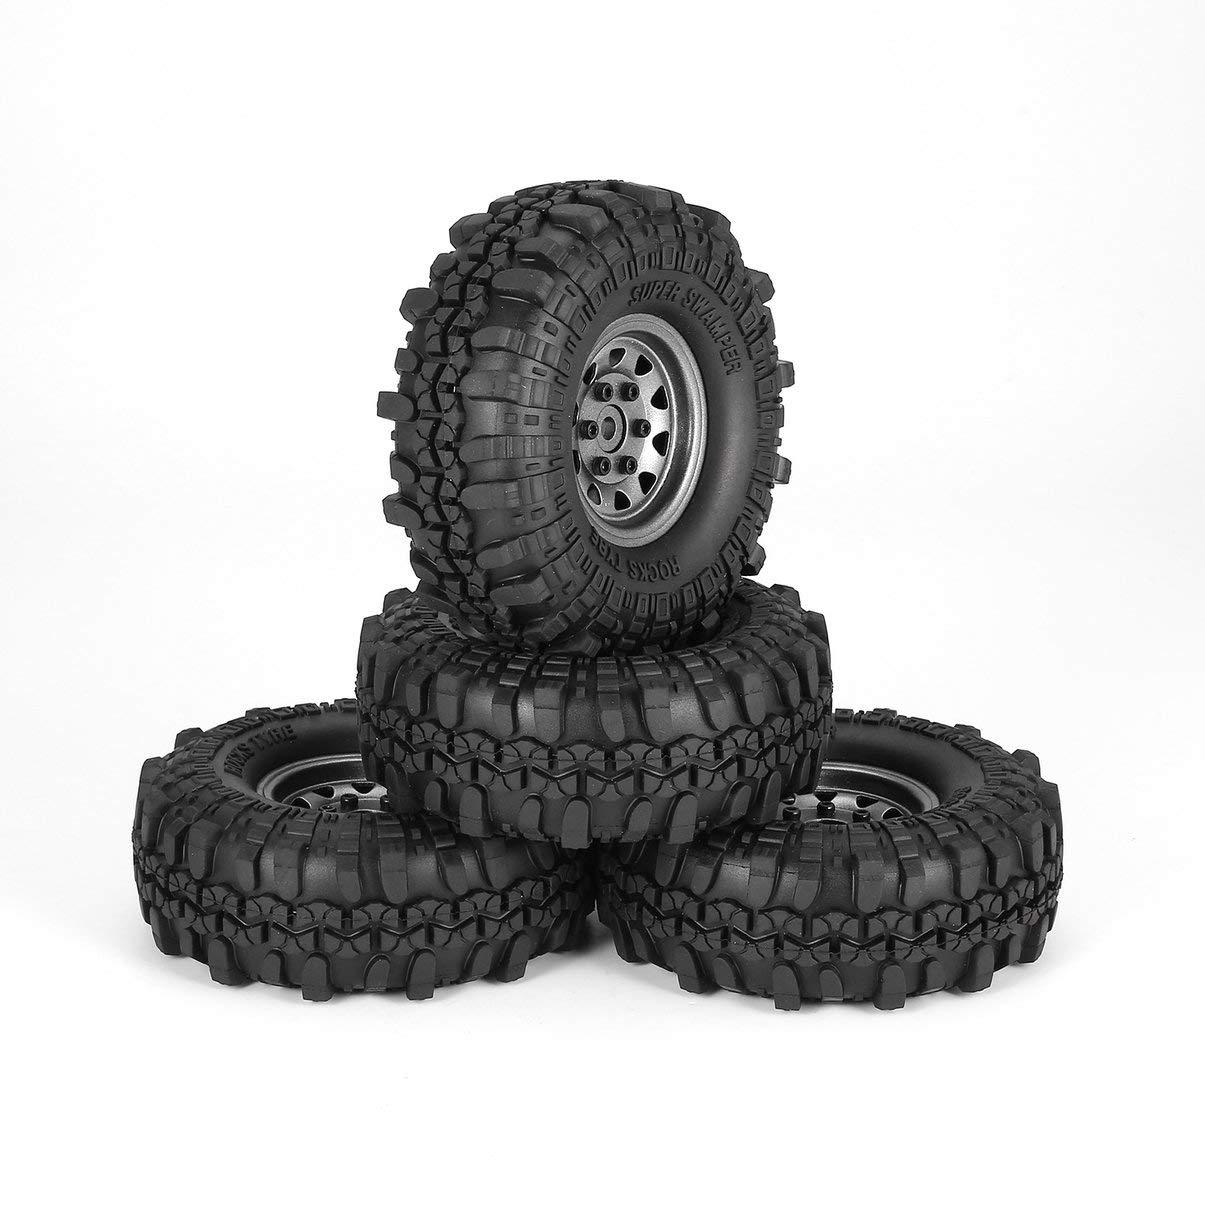 JullyeleDEgant 4Pcs 1.9 Inch 110mm Rubber Tires Tire with Metal Wheel Rim Set for 1/10 Traxxas TRX-4 SCX10 RC4 D90 RC Crawler Car Part